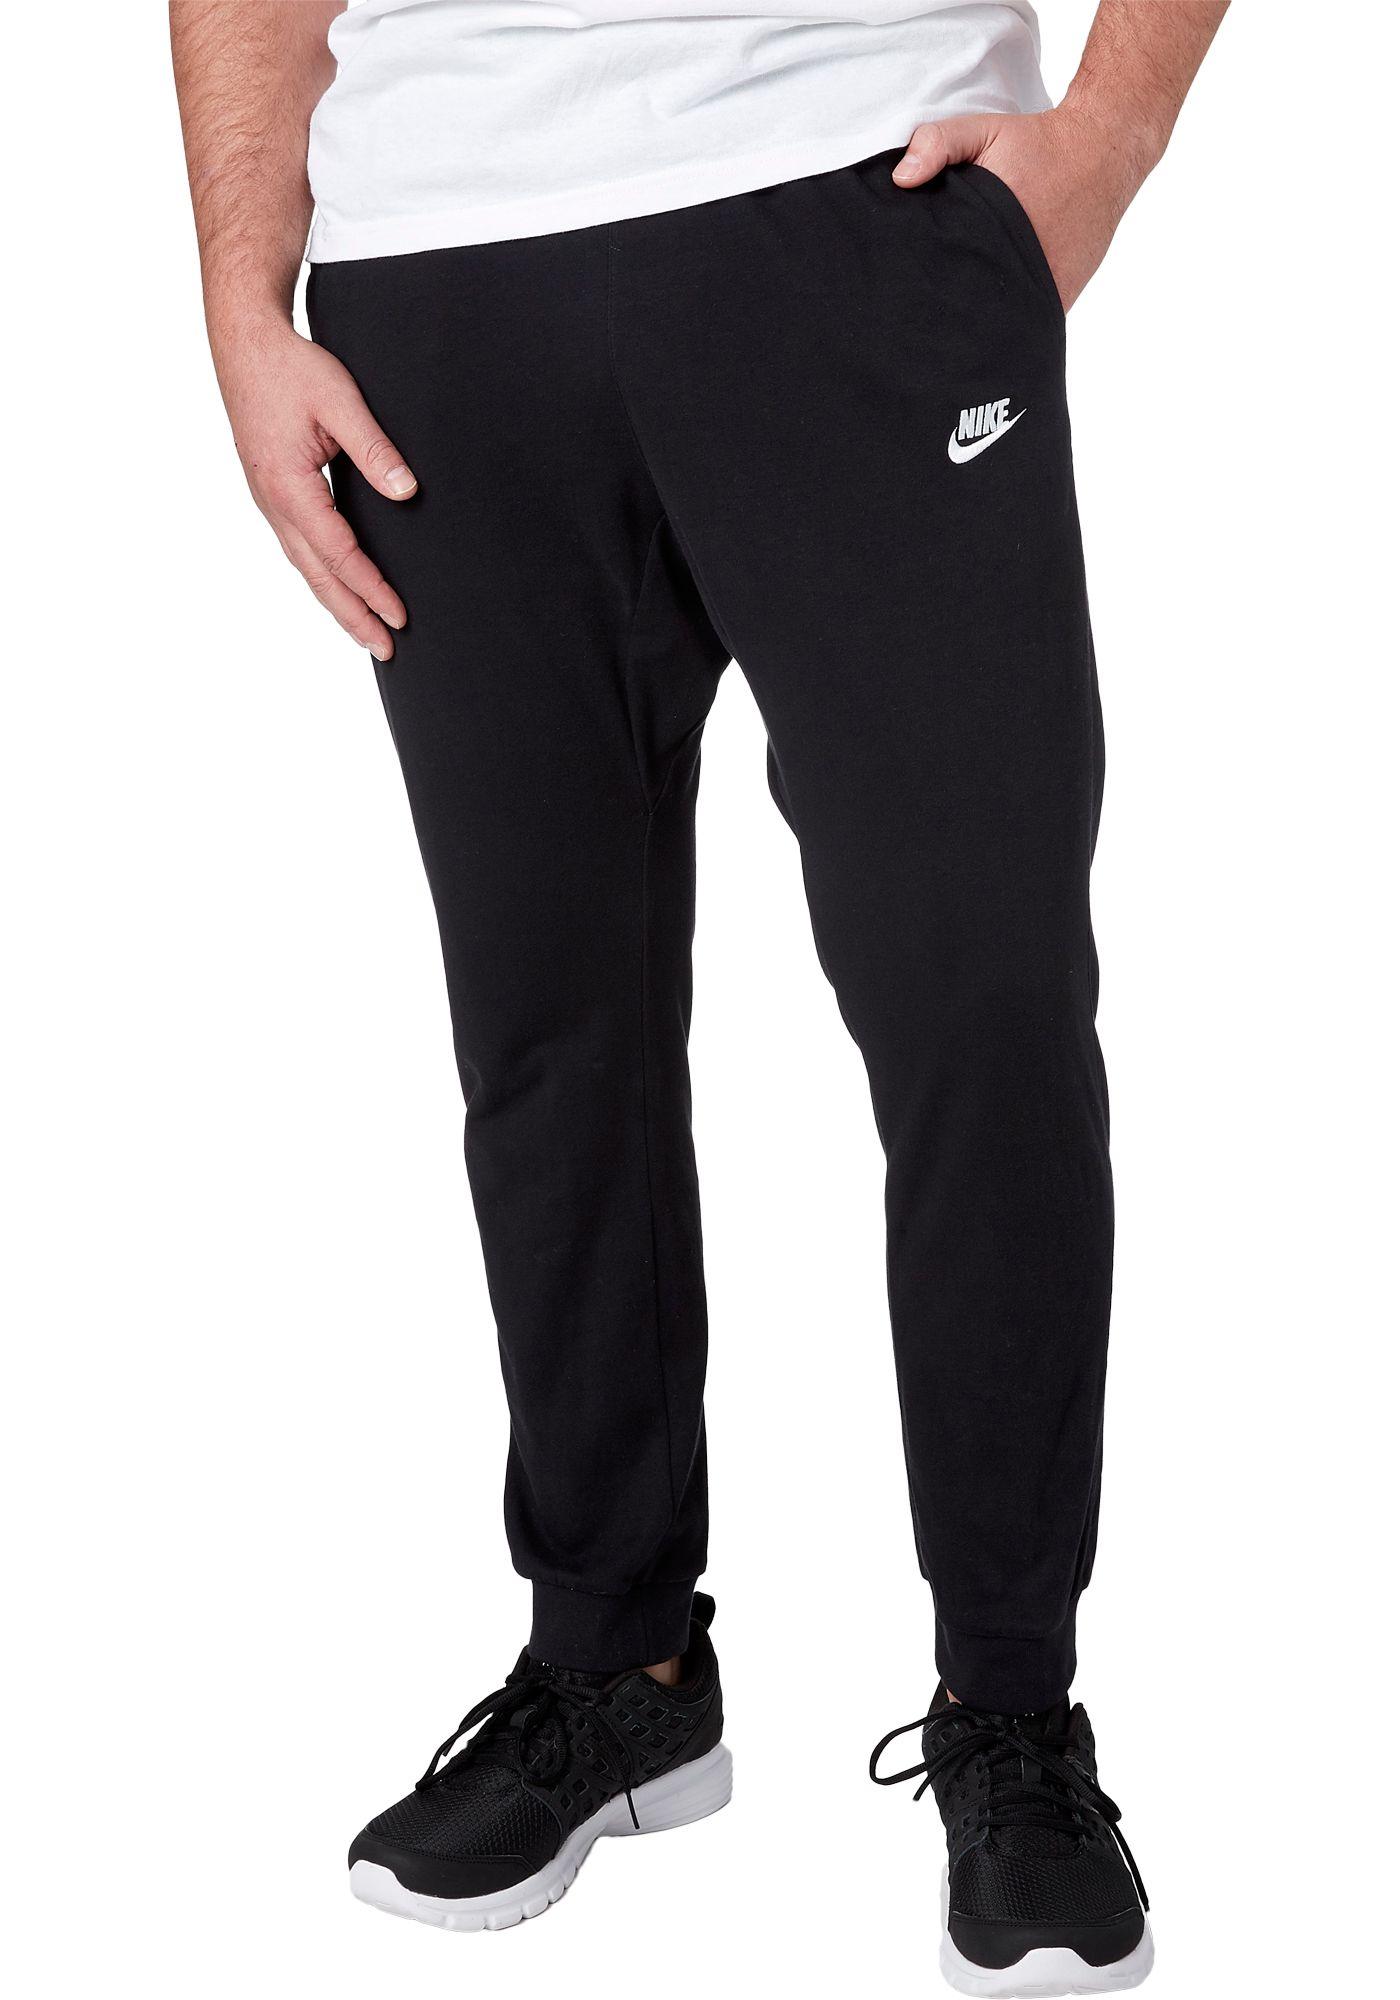 Nike Men's Jersey Lightweight Joggers